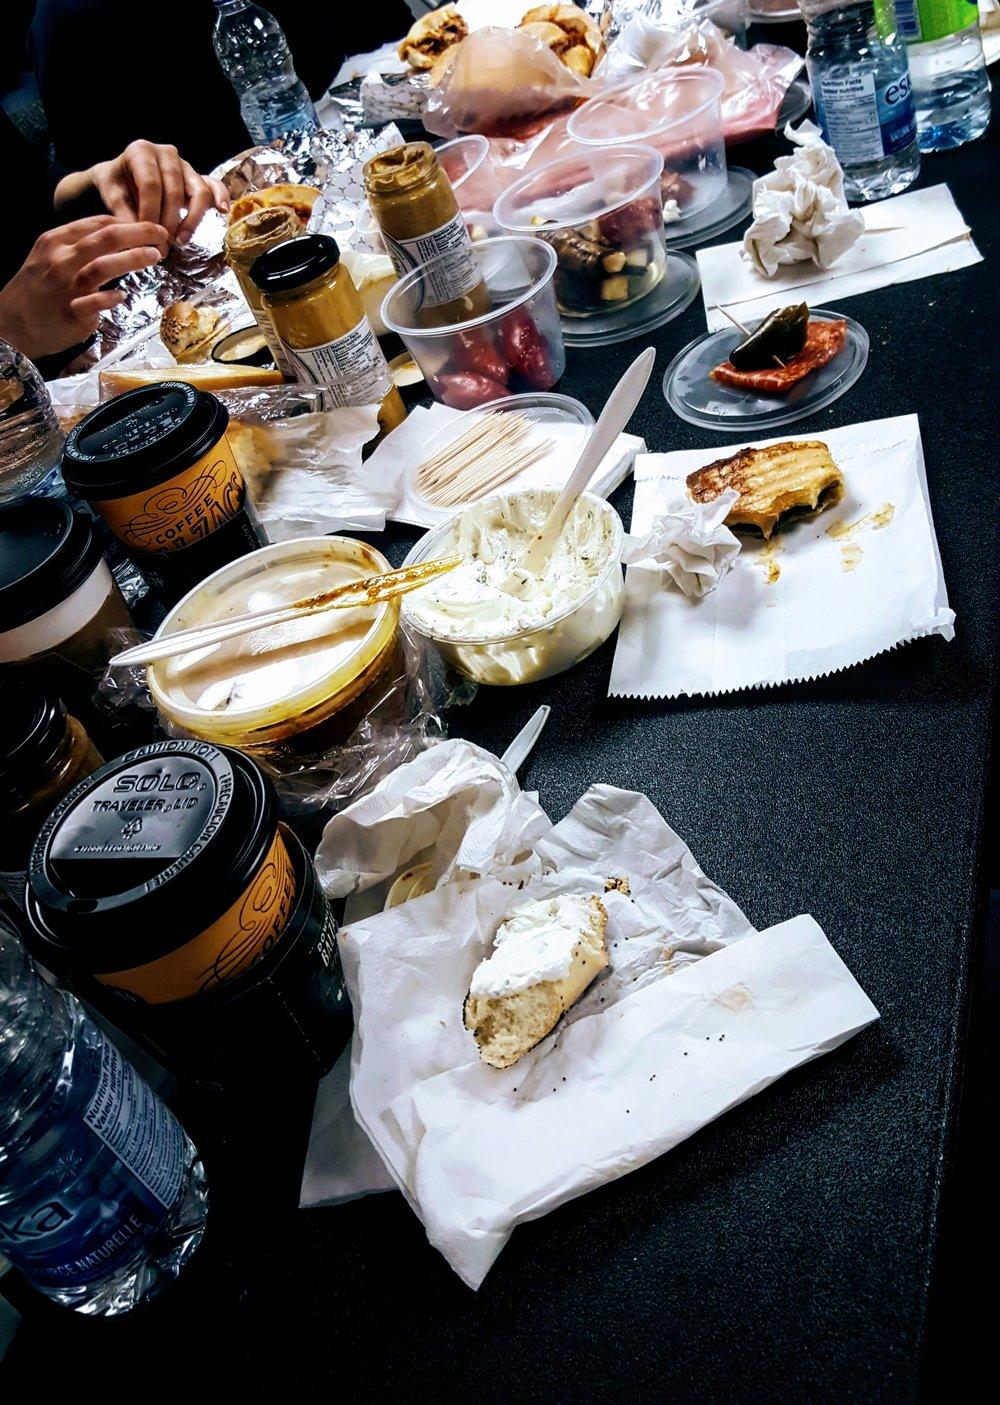 St. Lawrence Market picnic feast